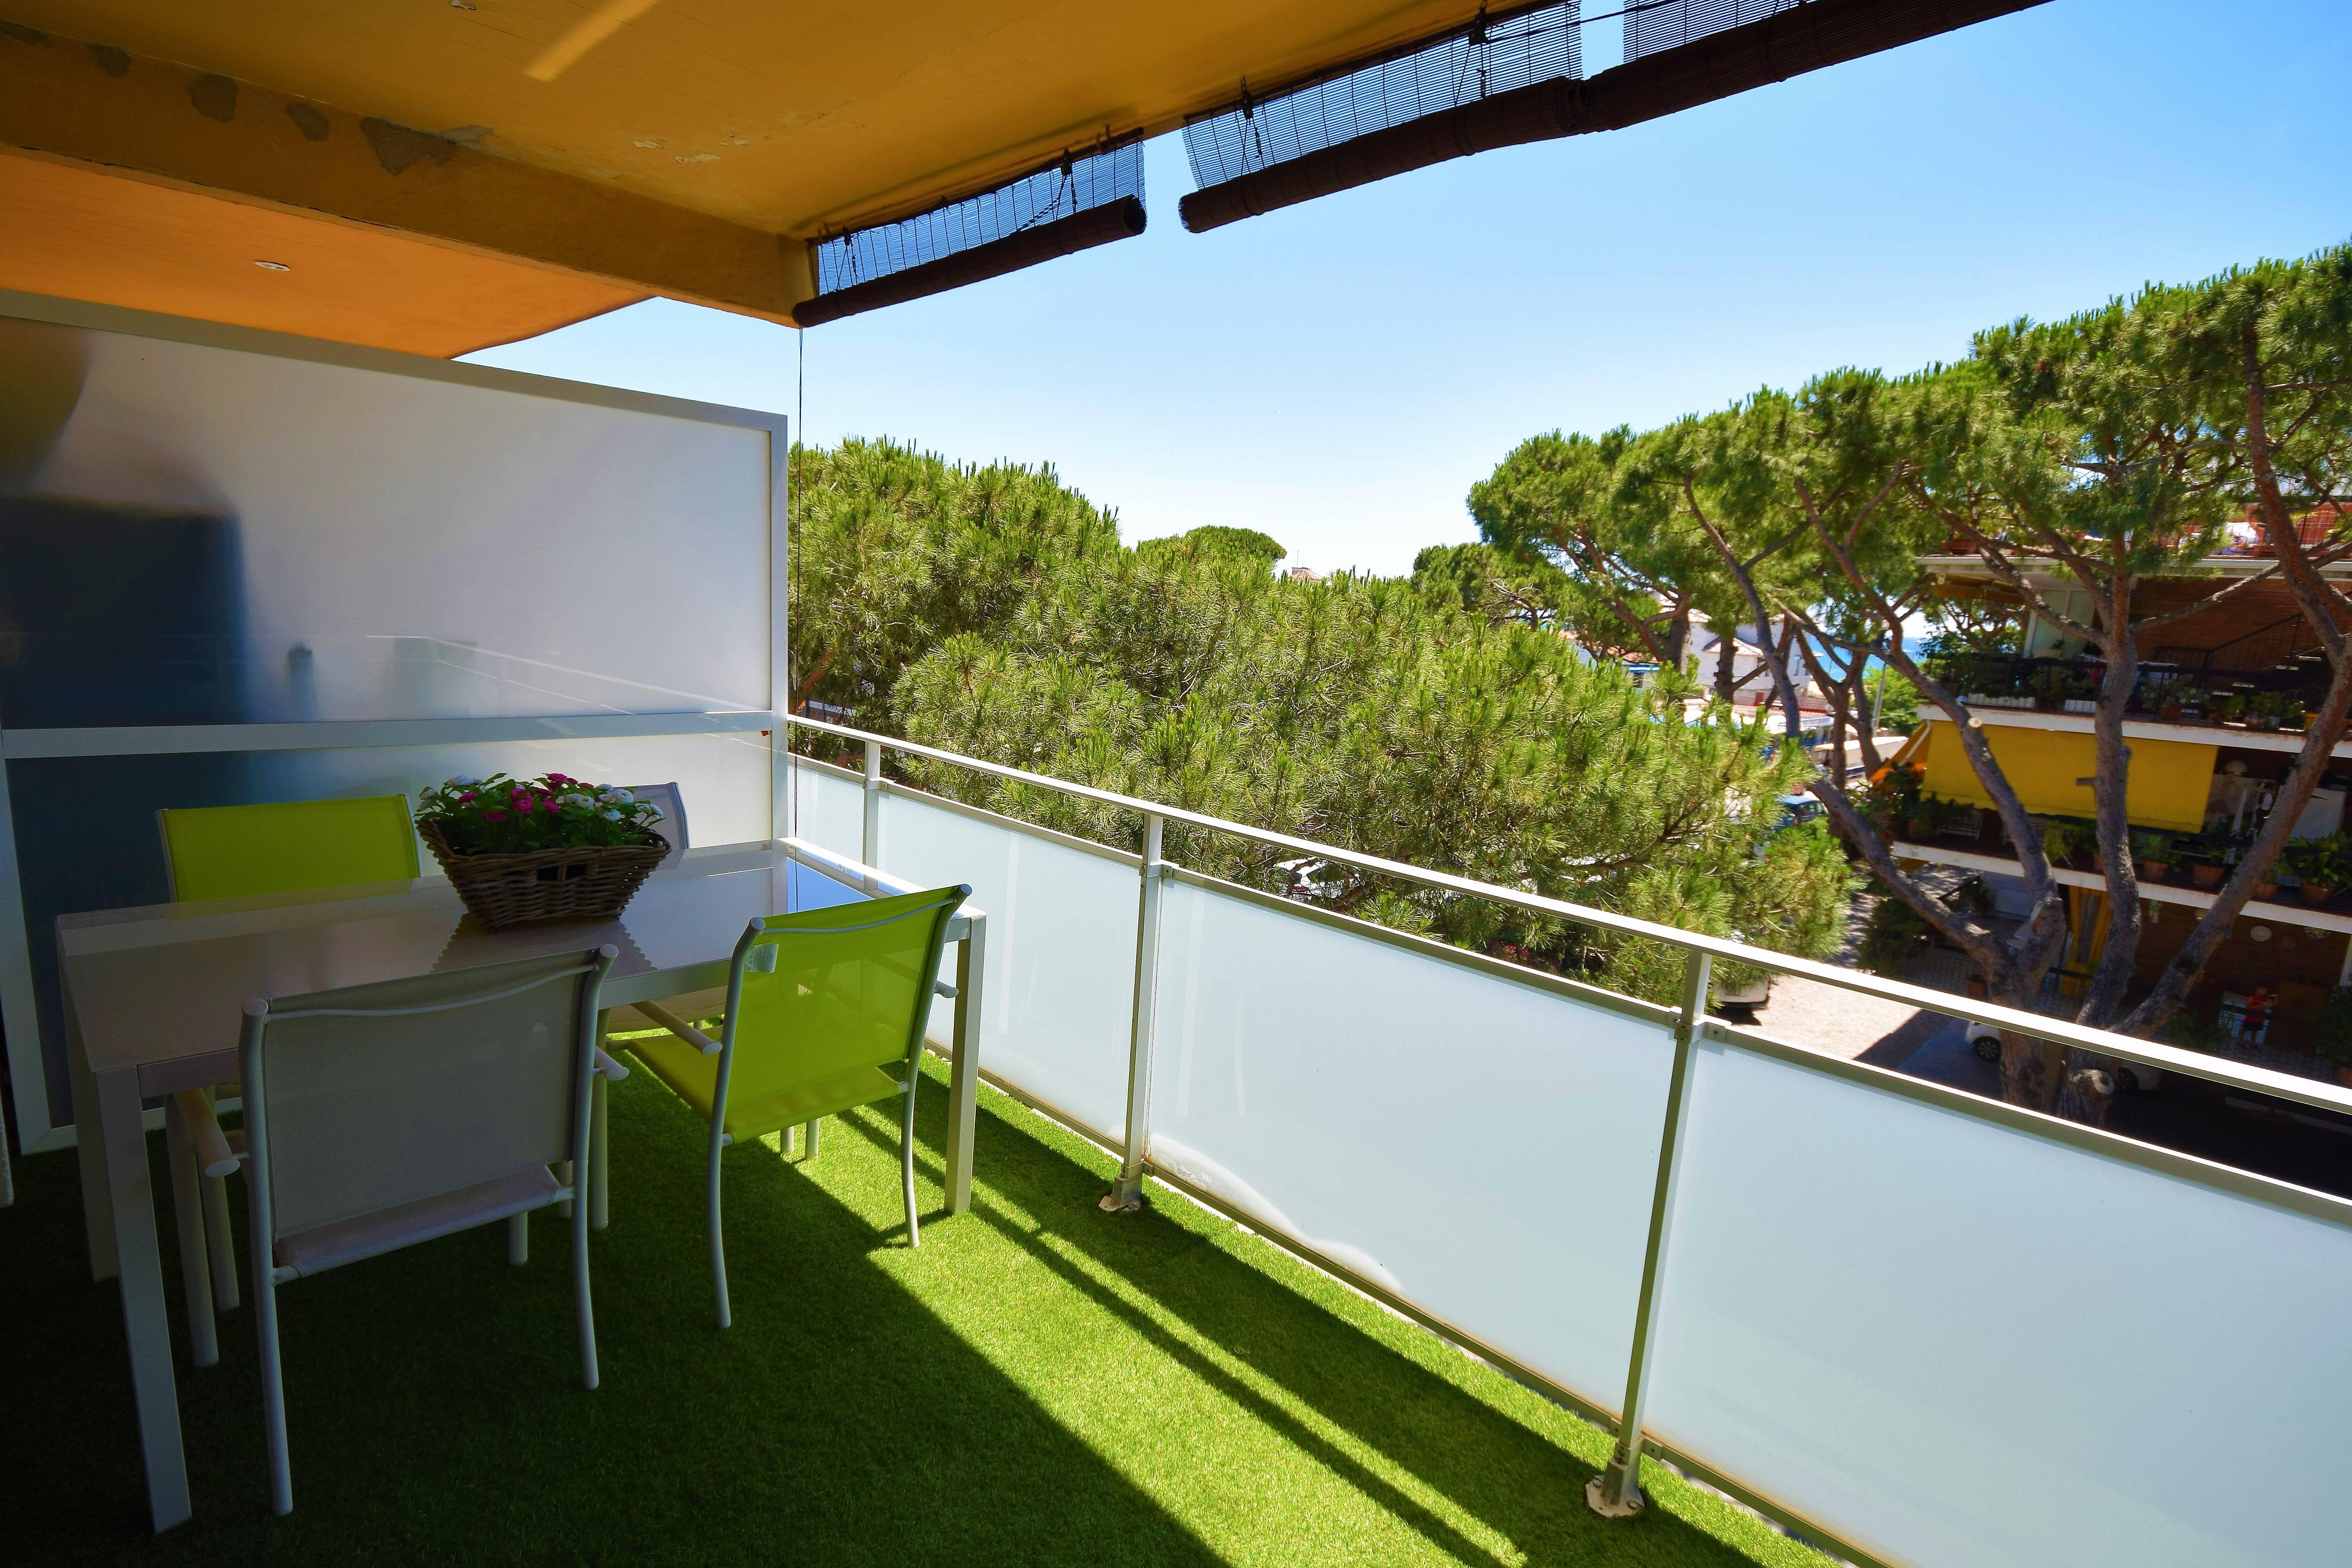 Apartamento nuevo con terraza al mar castelldefels for Terraza del apartamento